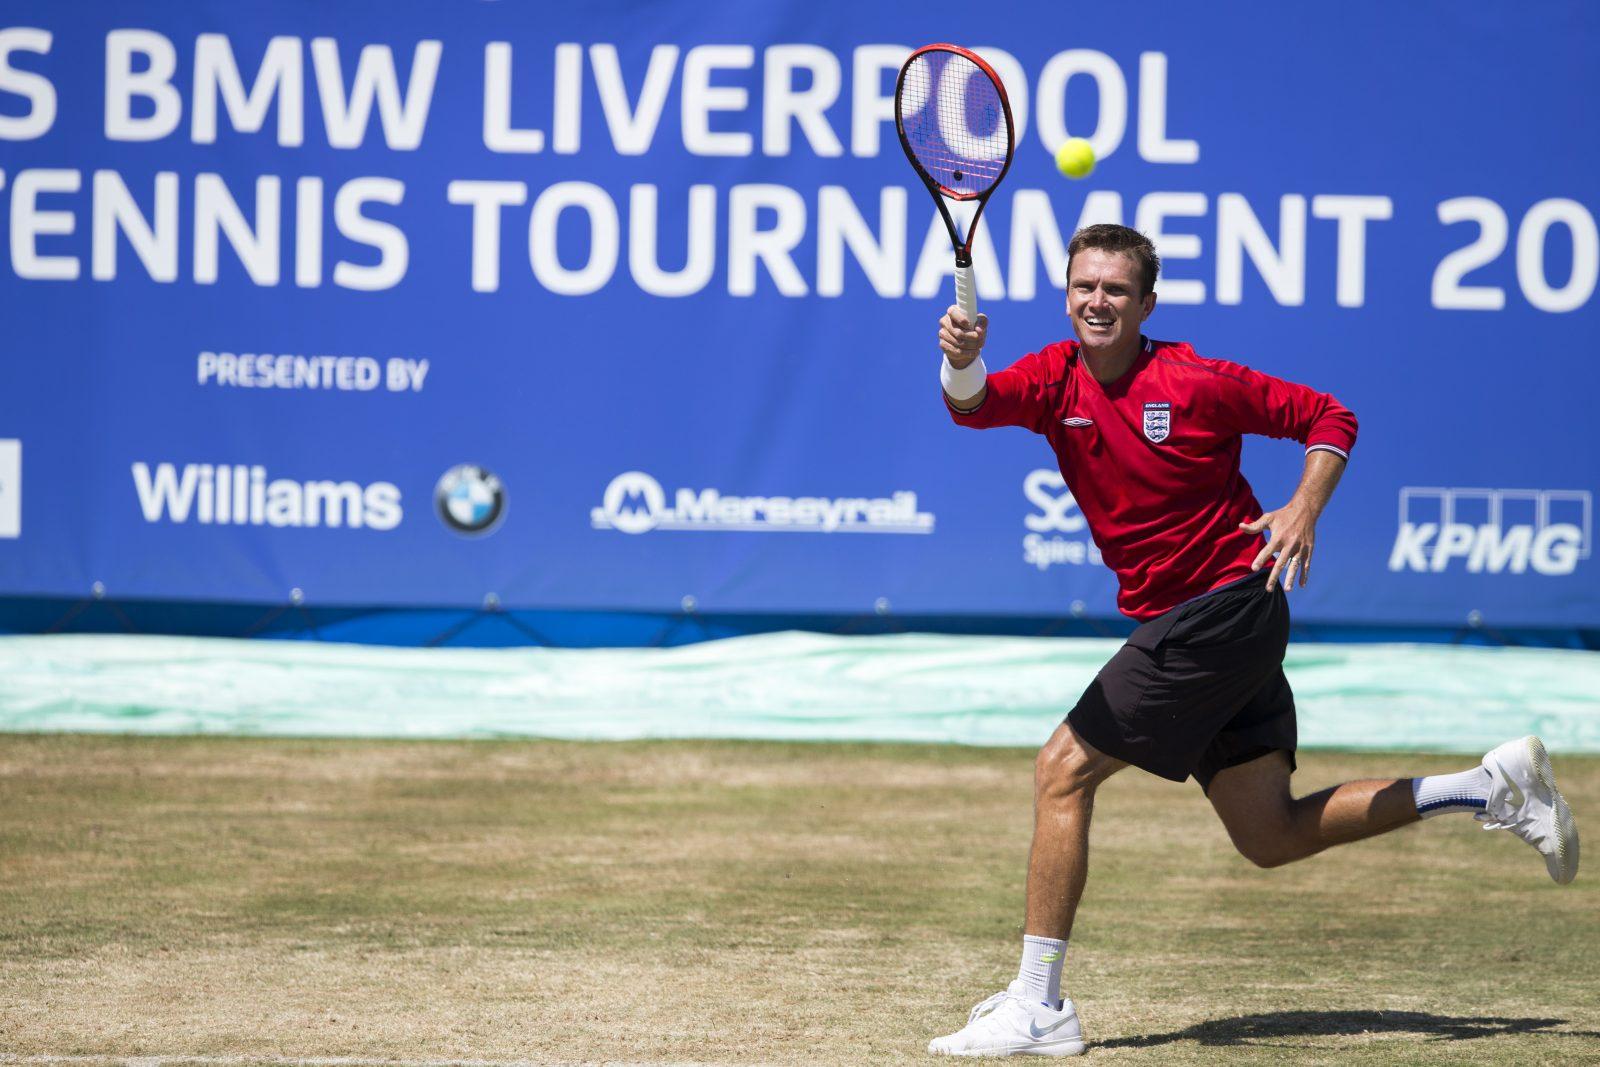 P180624-007-Liverpool_Tennis_D4-1600×1067